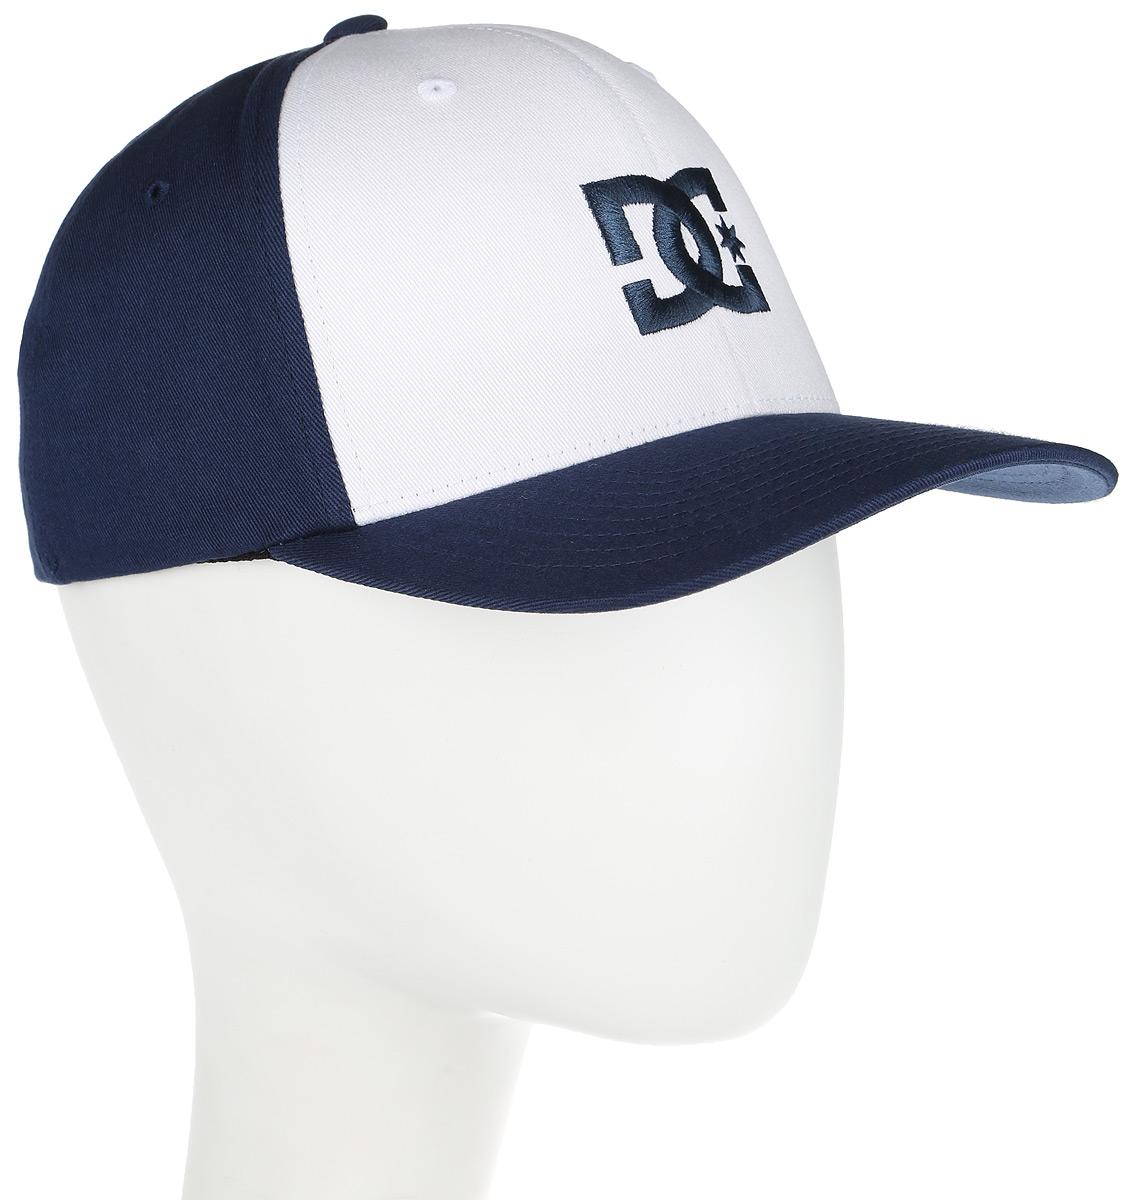 Бейсболка мужская DC Shoes Cap Star, цвет: синий, белый. 55300096-BYJ0. Размер S/M (54/56)